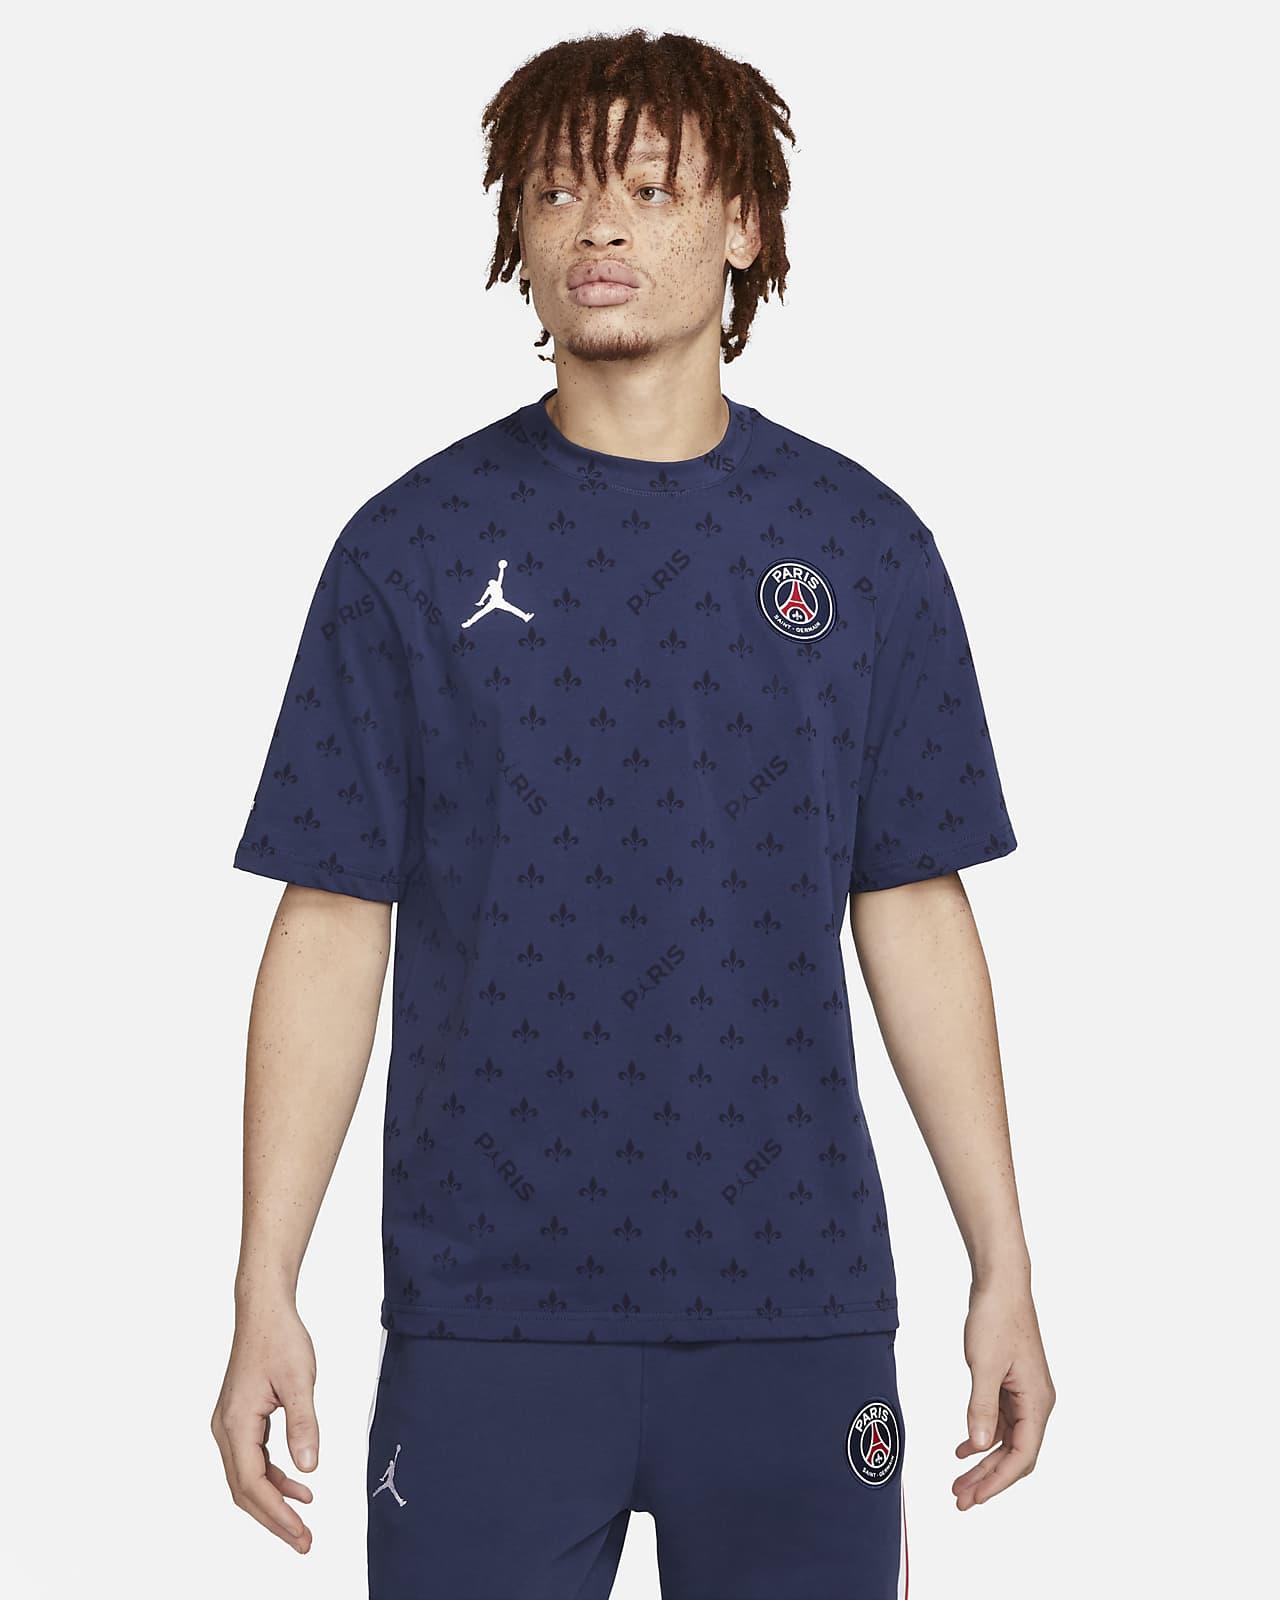 Paris Saint-Germain Statement T-skjorte til herre